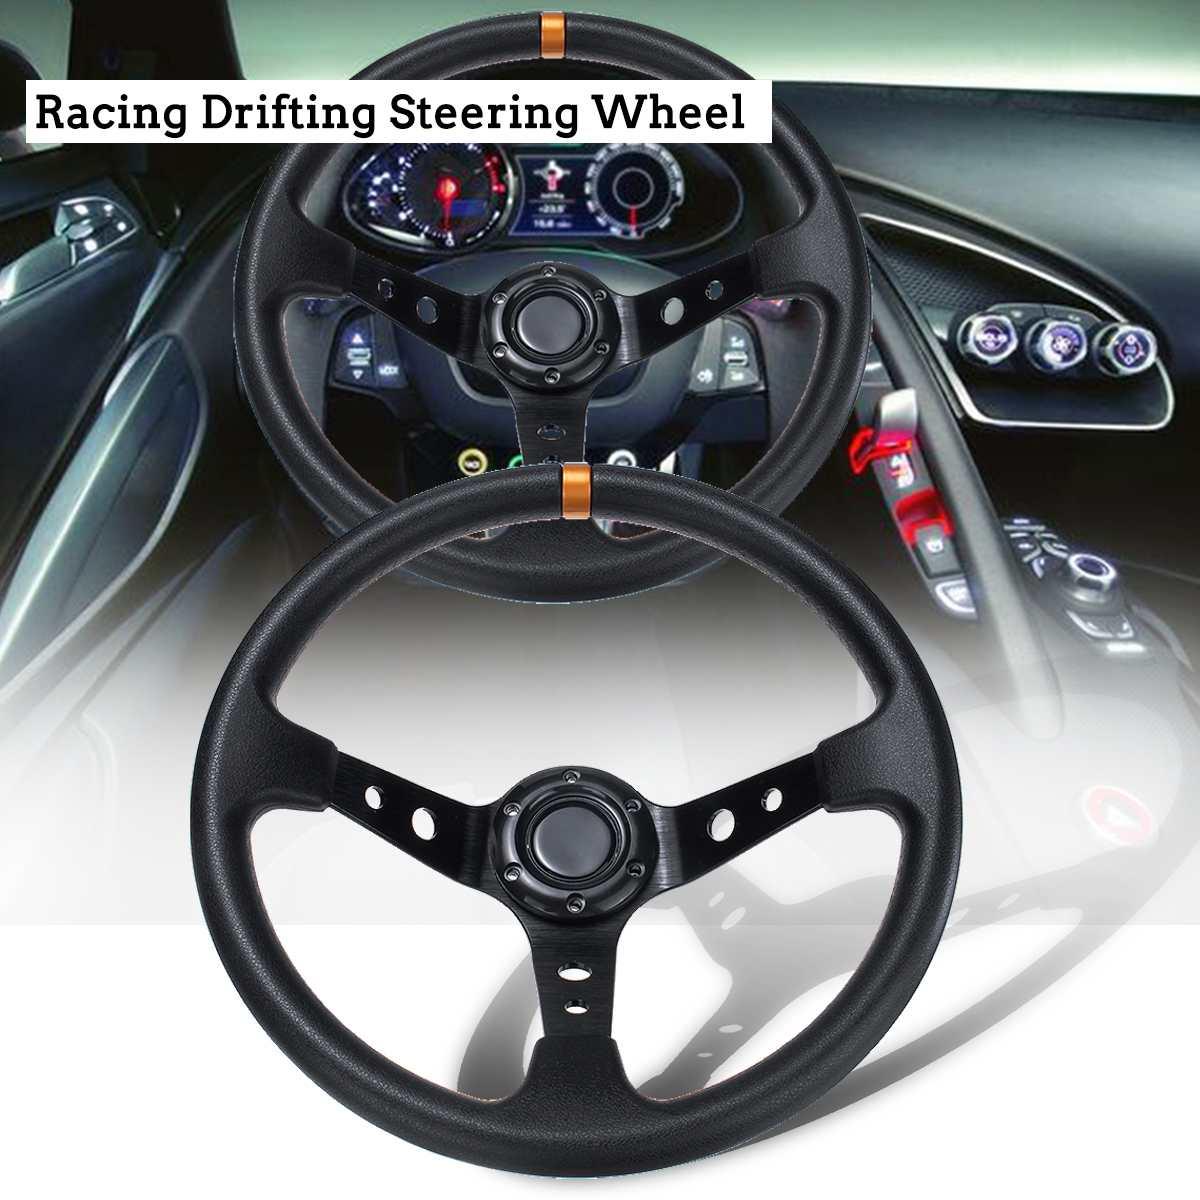 Auto Racing Stuurwiel Drift Auto Sport Stuurwiel 14 Inch 350 Mm Pu & Aluminium Universele Deep Dish Corn gewijzigde Delen